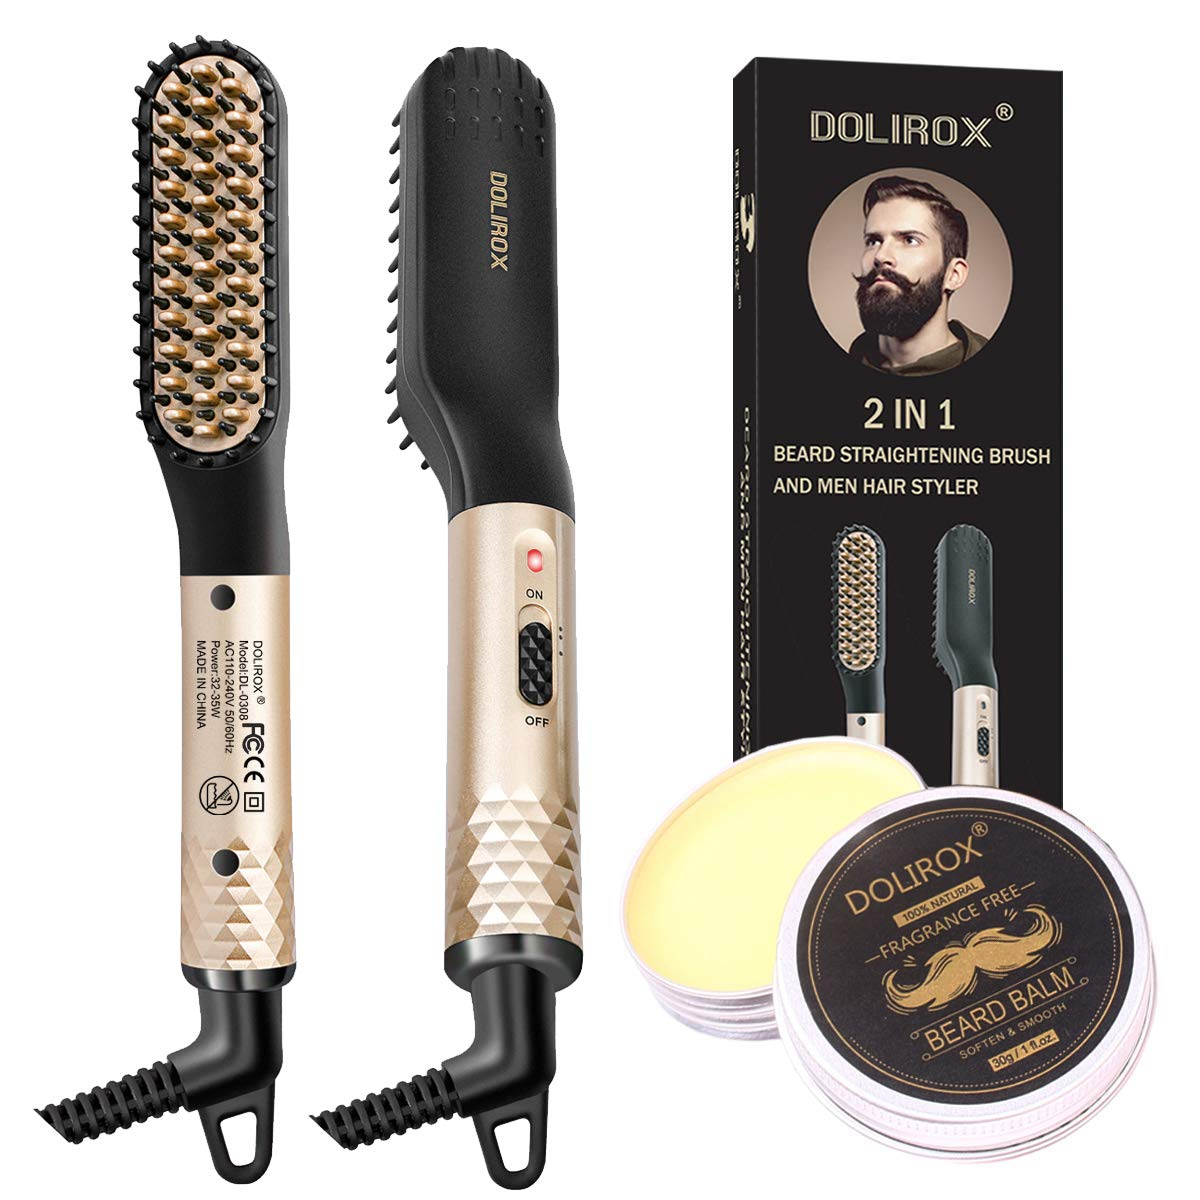 Amazon Com Beard Straightener Heated Beard Comb Electric Straightening Comb With Beard Balm And Beard Straightening Brush Hair Straightening Comb Gifts For Dad Him Men Beauty